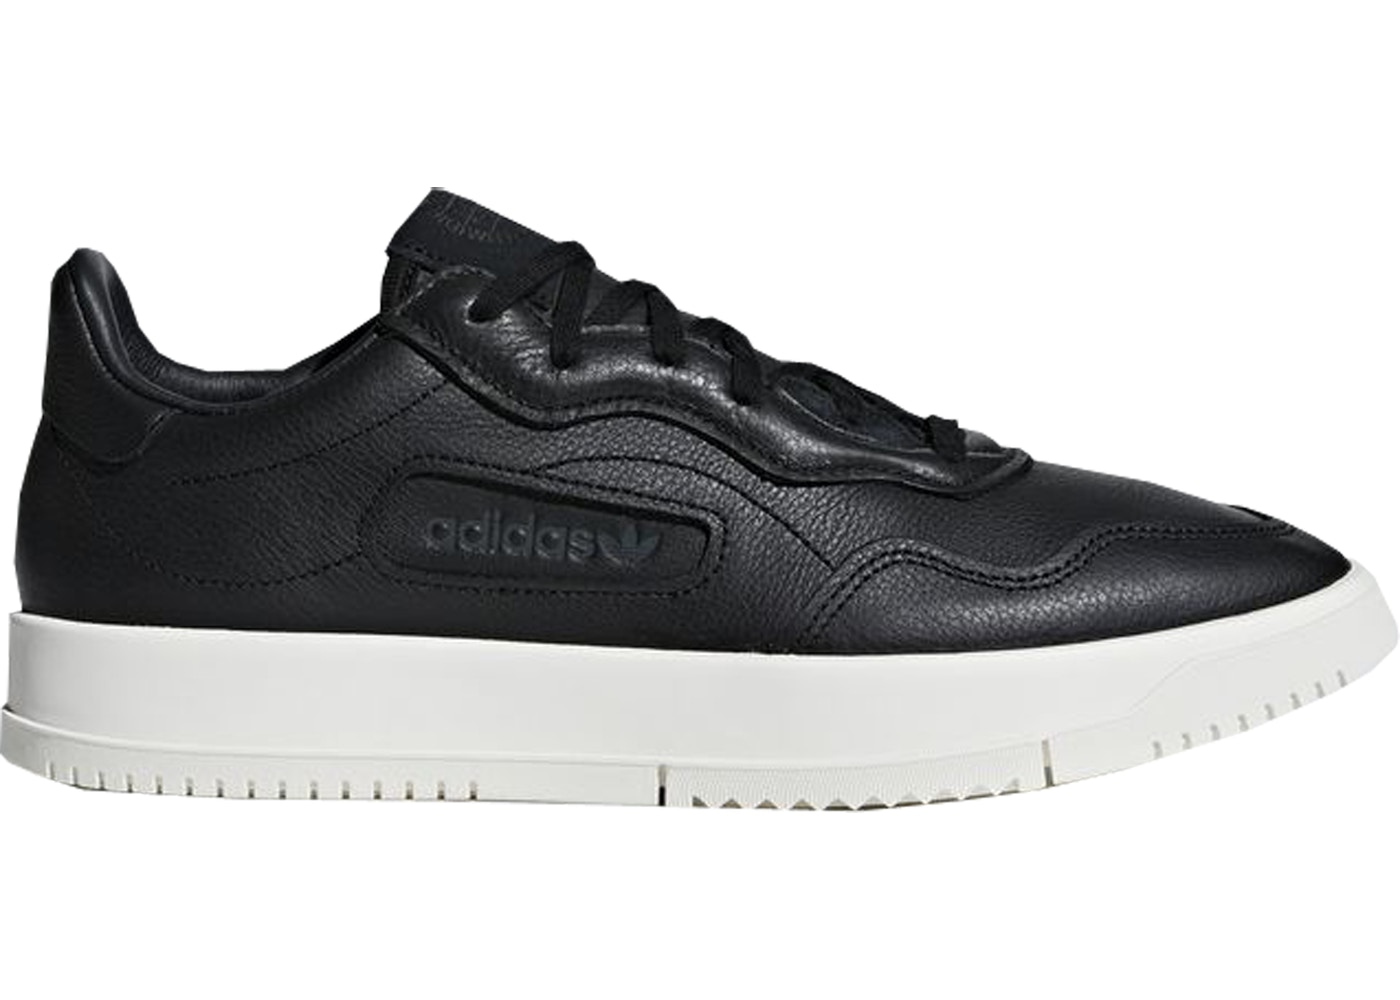 244d194a7aa8f adidas SC Premiere Black White - BD7869